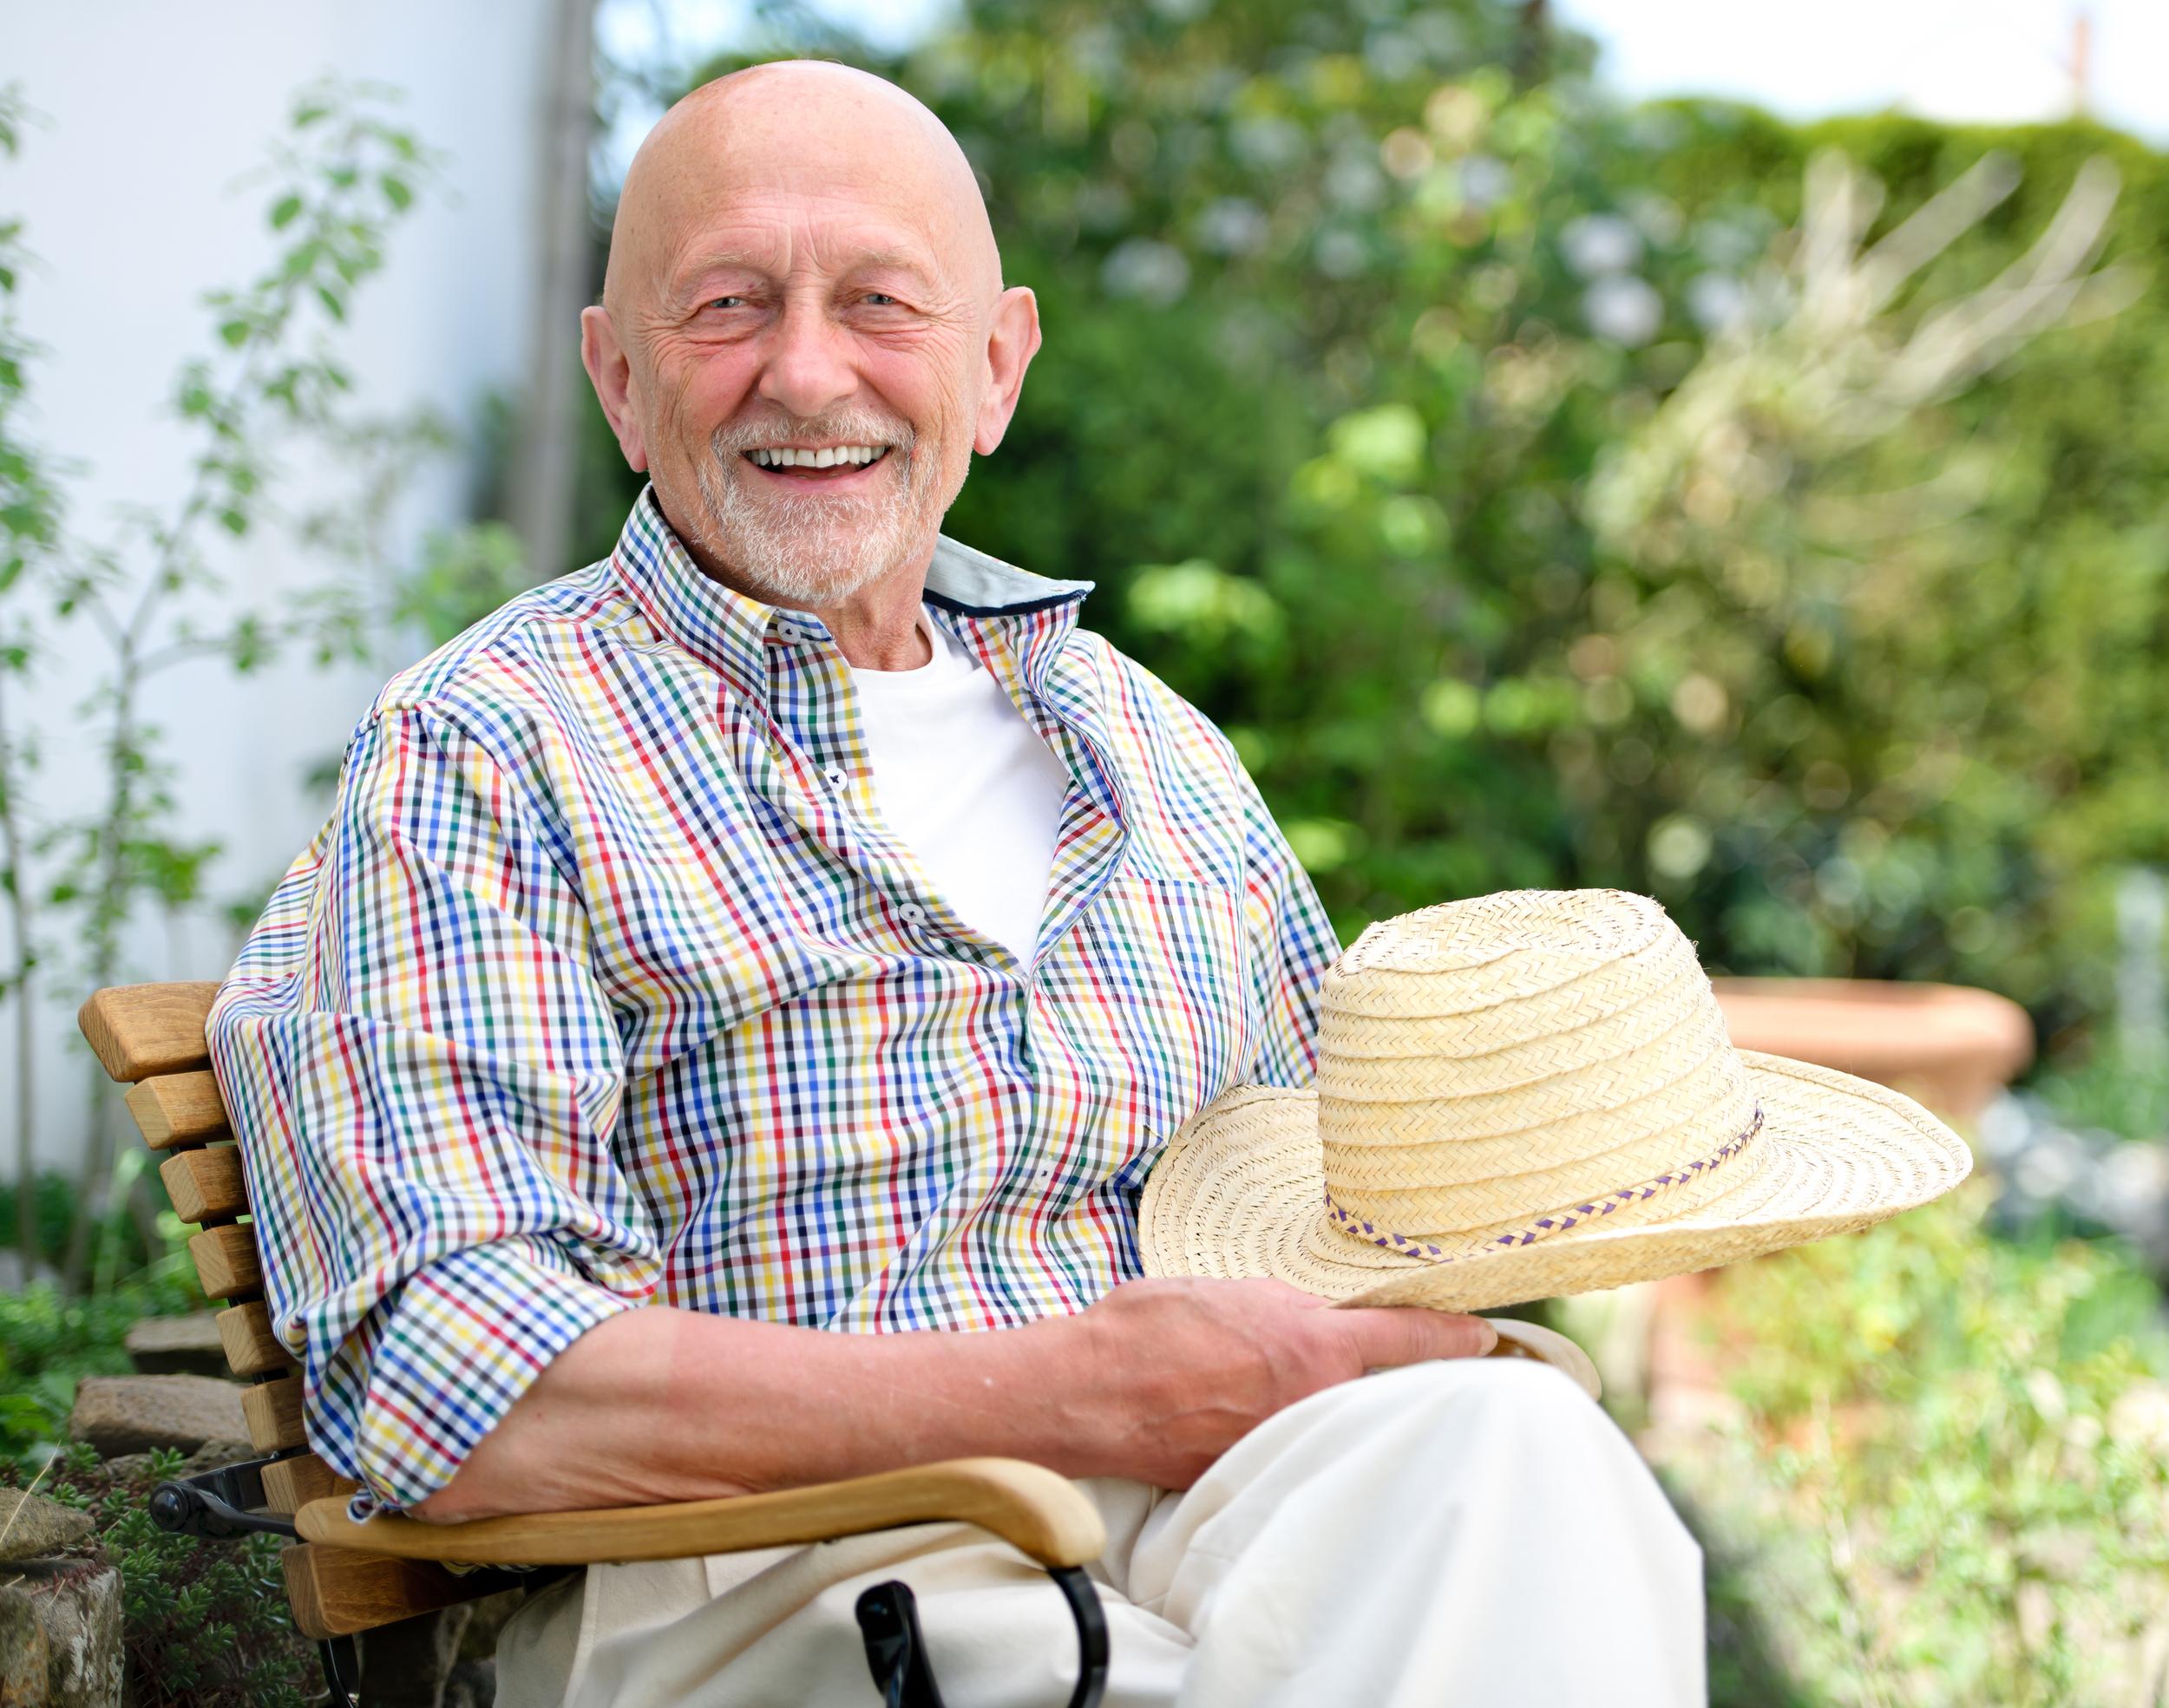 bigstock-Portrait-Of-Senior-Man-33386849.jpg